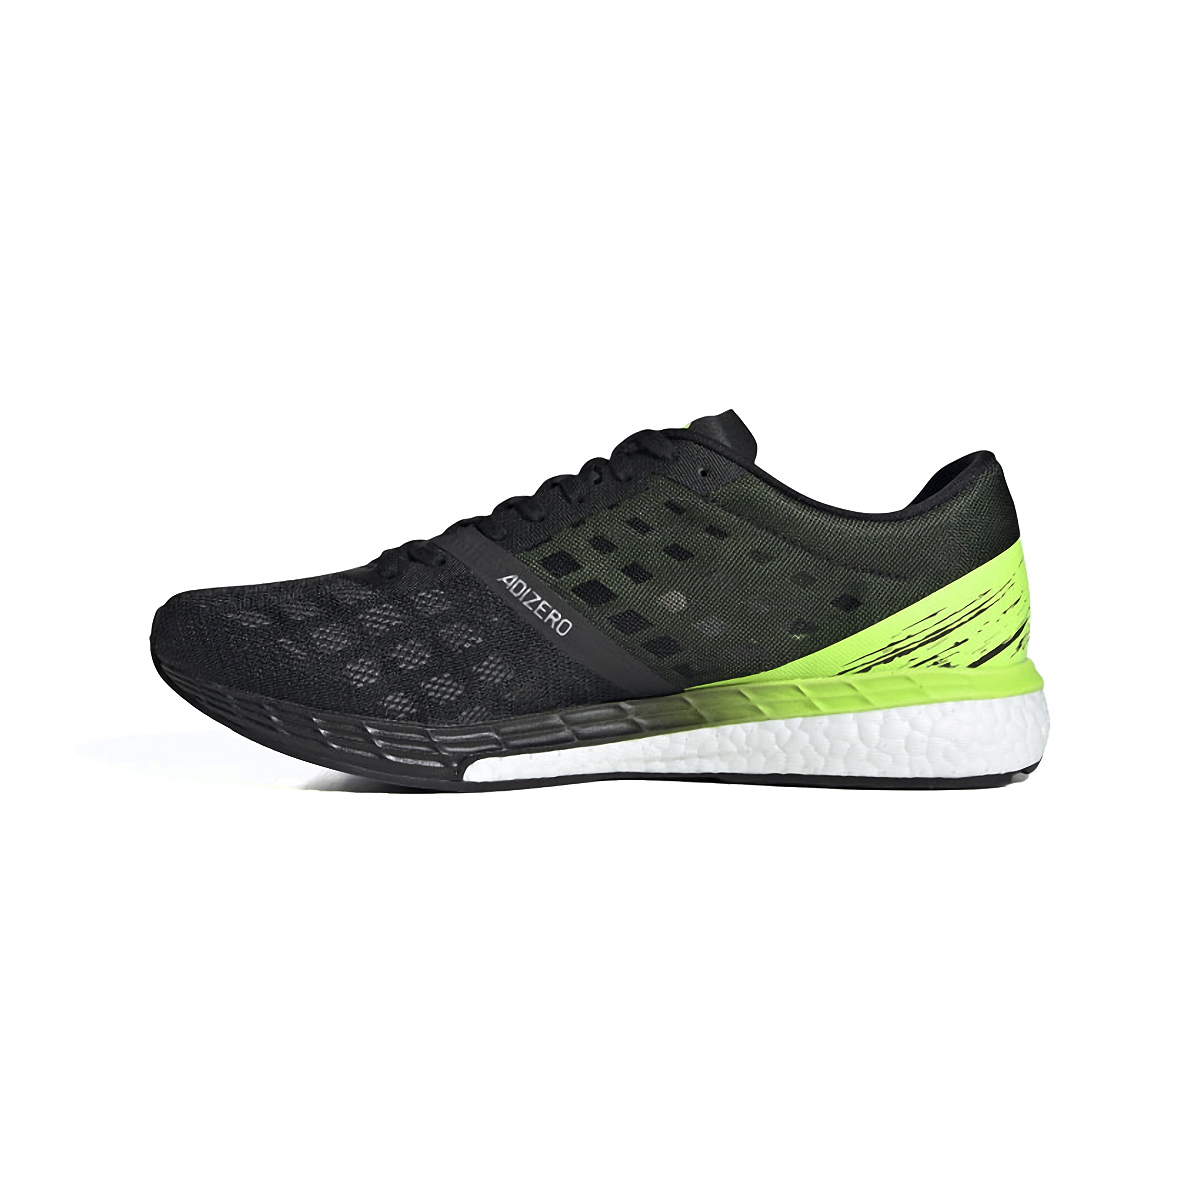 Men's Adidas Adizero Boston 9 Running Shoe - Color: Core Black/Core - Size: 6.5 - Width: Regular, Core Black/Core, large, image 2